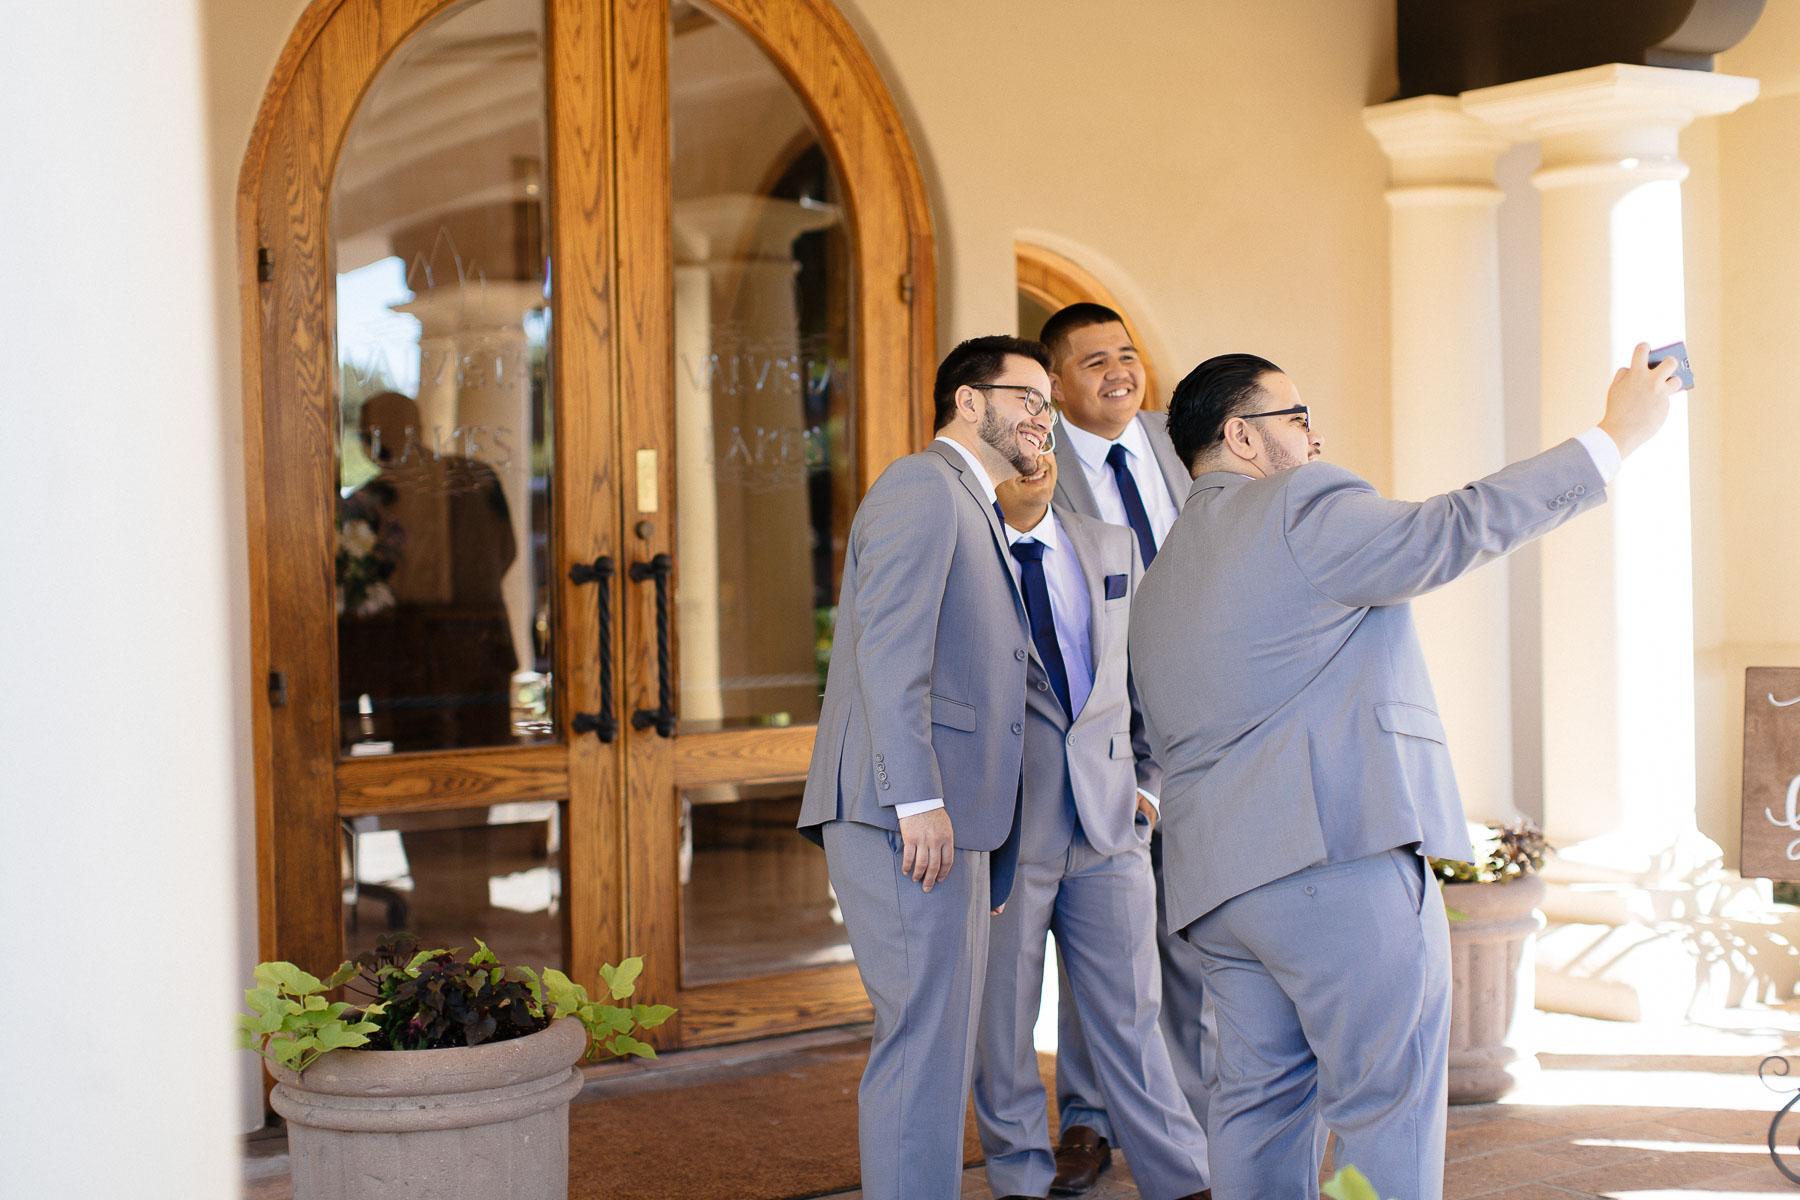 161029-Luxium-Weddings-Arizona-Jeff-Griselda-First-Look-Val-Vista-Lakes-Gilber-021.jpg